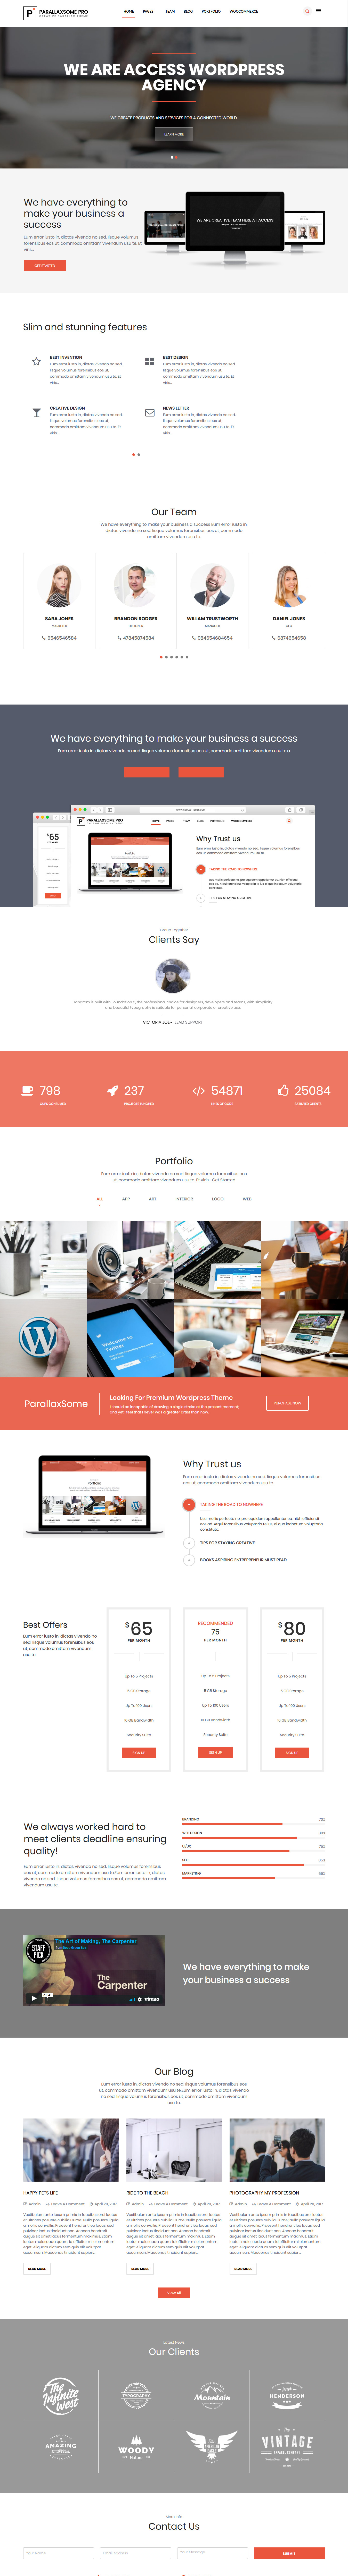 ParallaxSome - Best Premium Parallax WordPress Theme